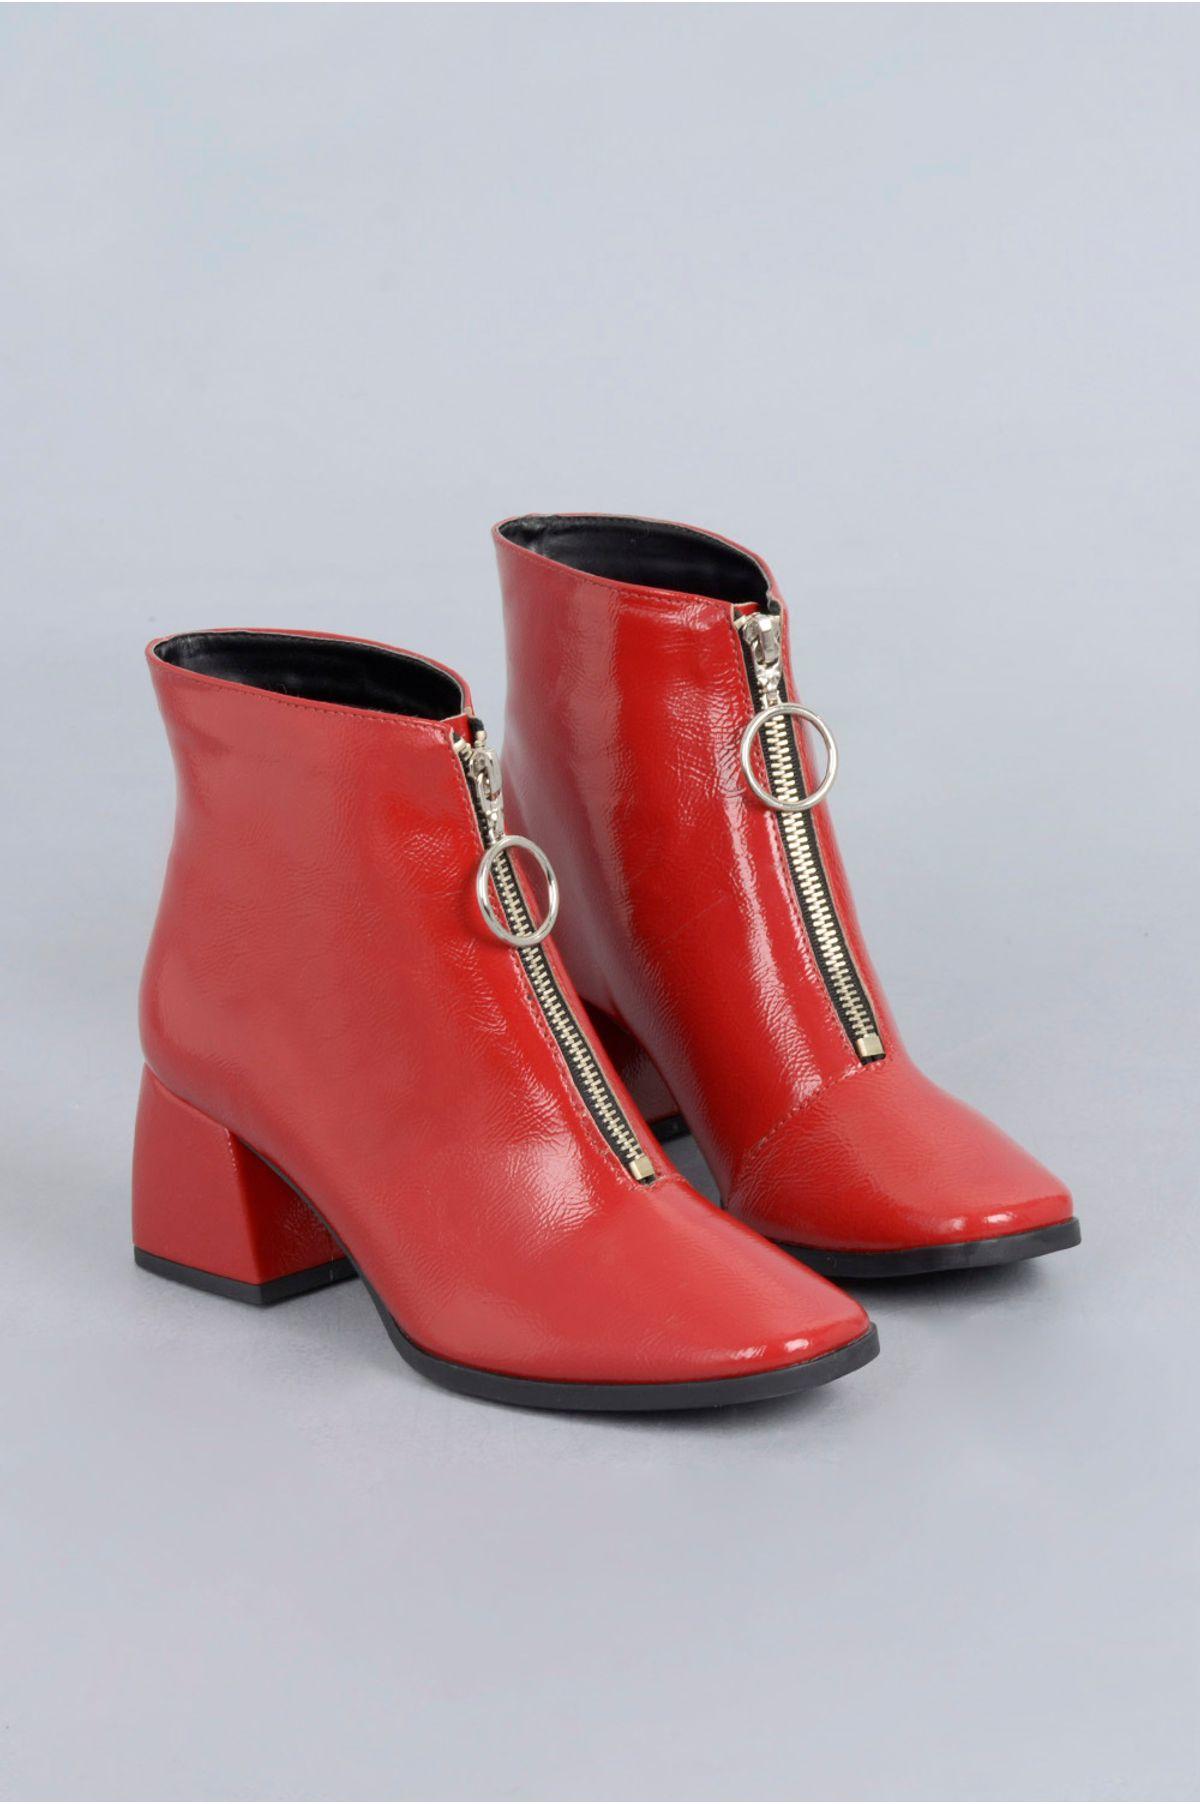 325ac0b8f6 Ankle Boot Chloe Mundial VERNIZ - VERMELHO - Mundial Calçados